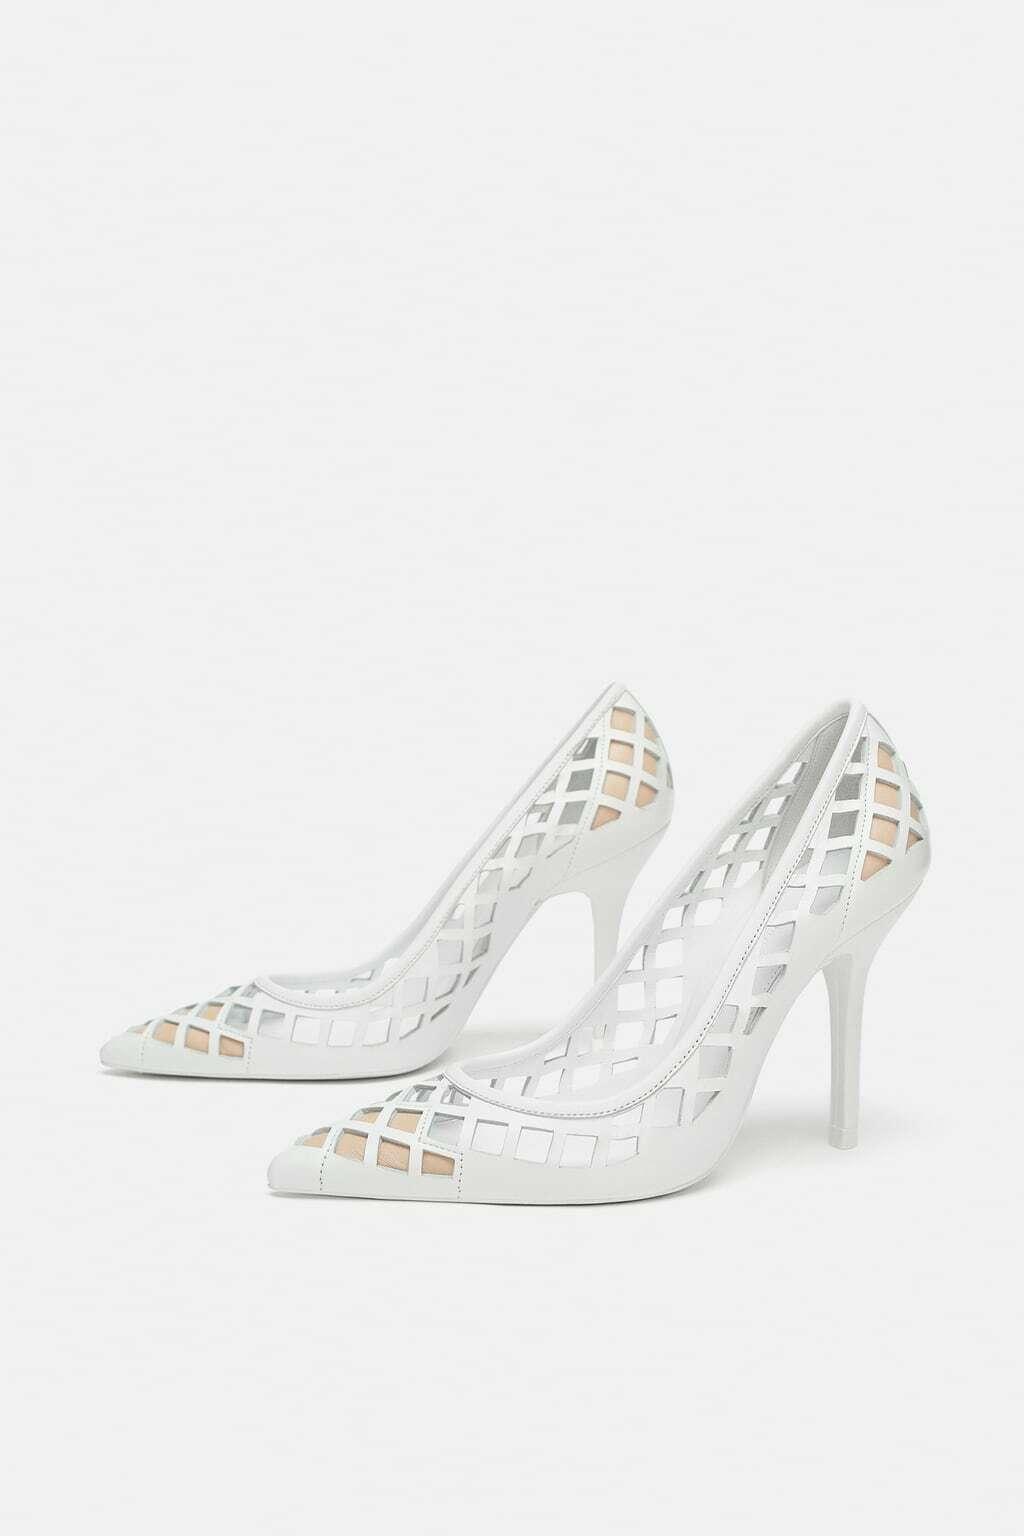 Zara Studio blancoo Cuero Calado Bombas Tacones Tribunal Zapatos Talla Talla Talla 36 euros  comprar mejor